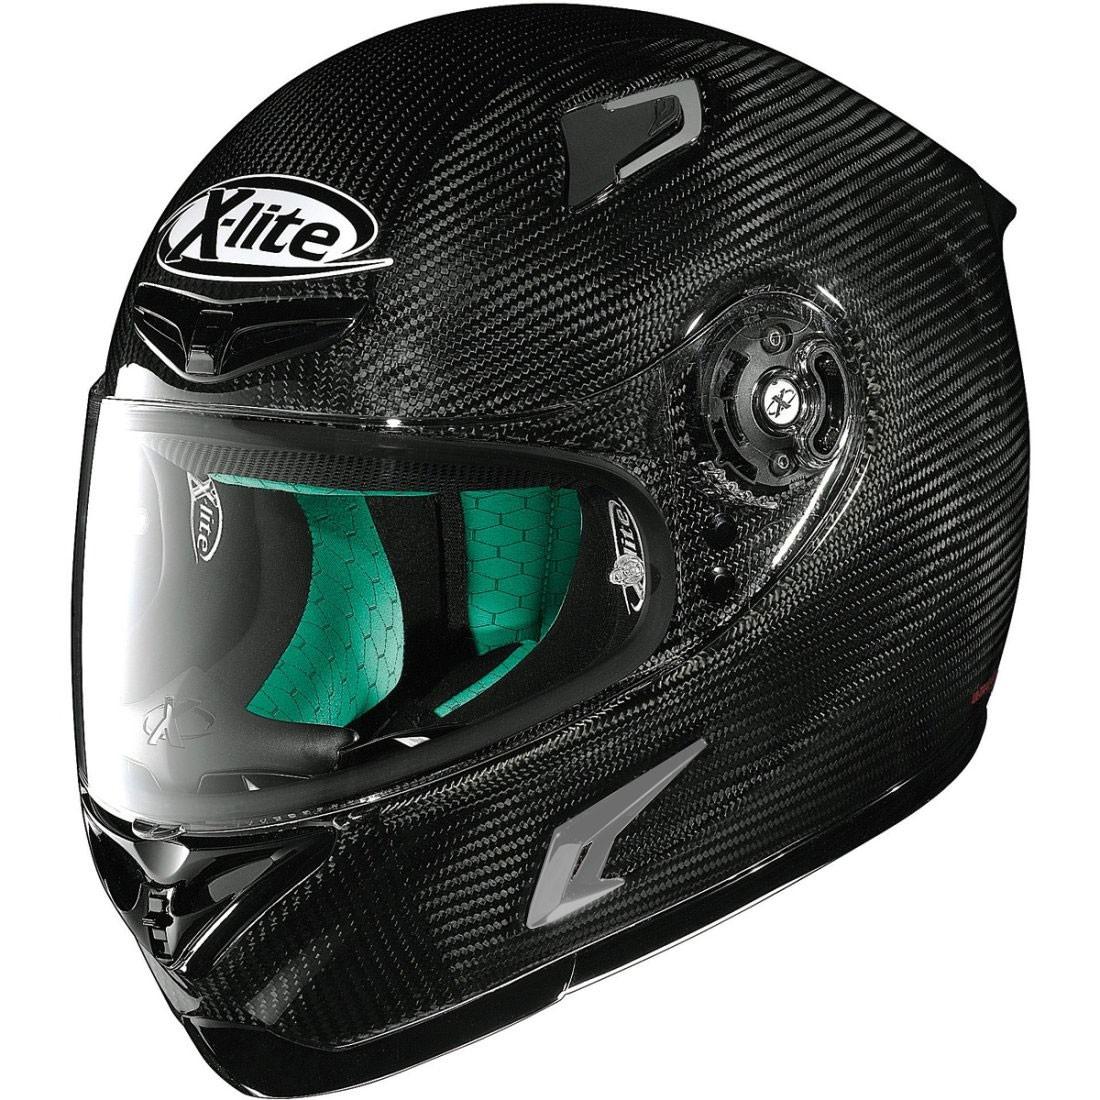 X-LITE X-802RR Ultra Carbon Puro Carbon Helmet